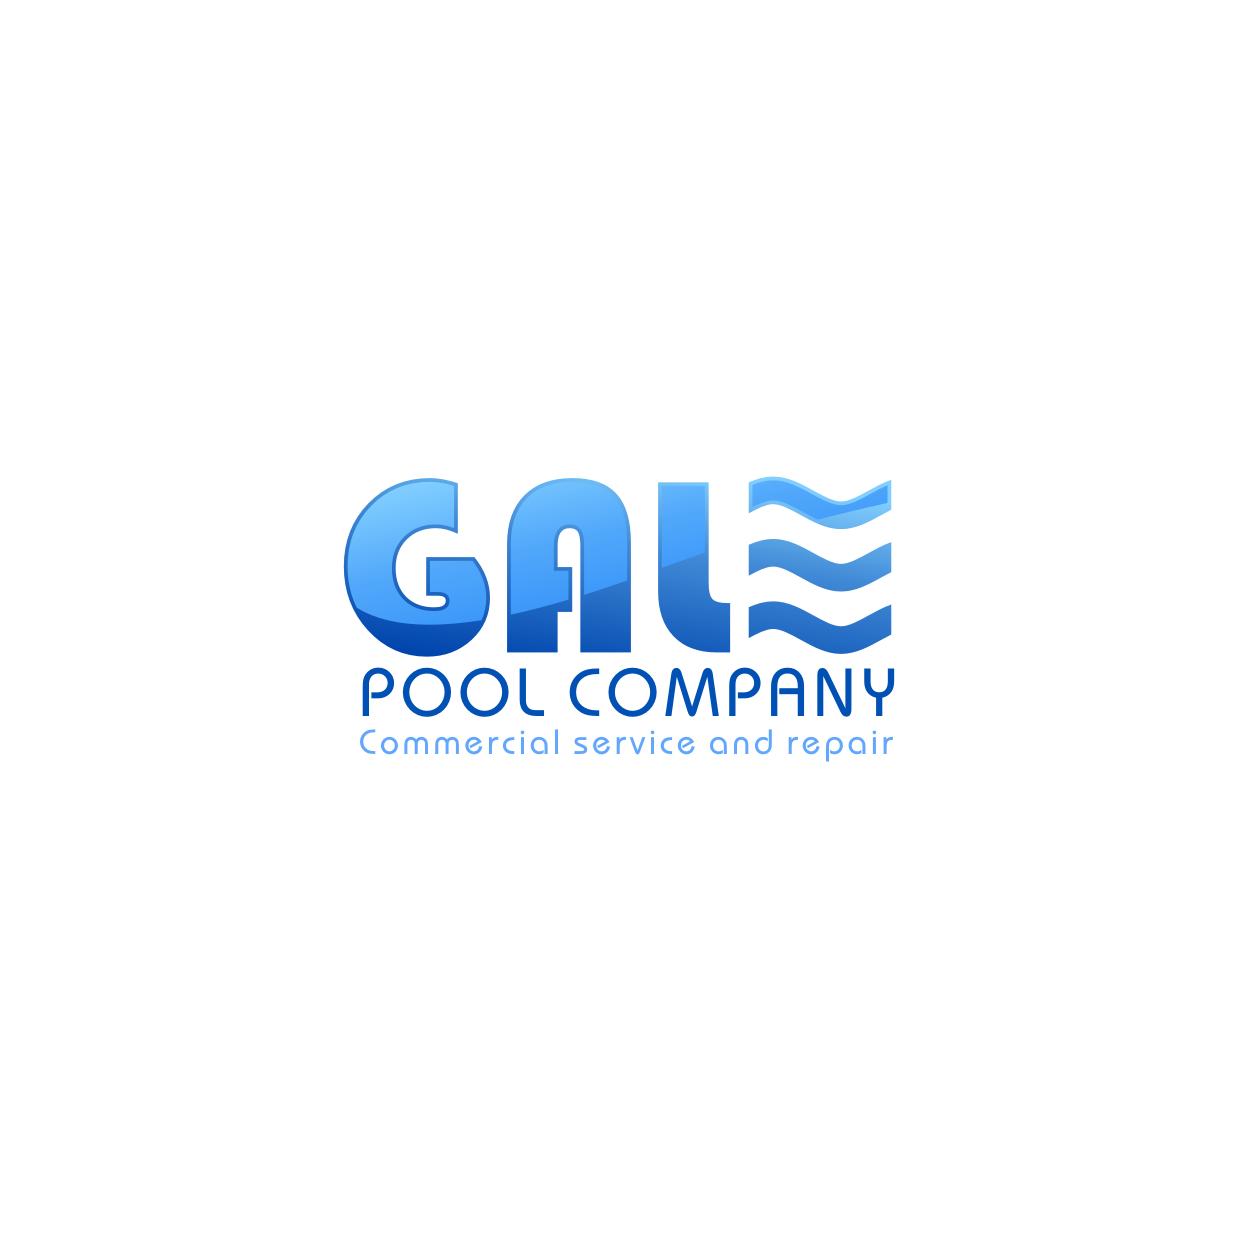 Logo Design by rifatz - Entry No. 82 in the Logo Design Contest Imaginative Logo Design for Gale Pool Company.